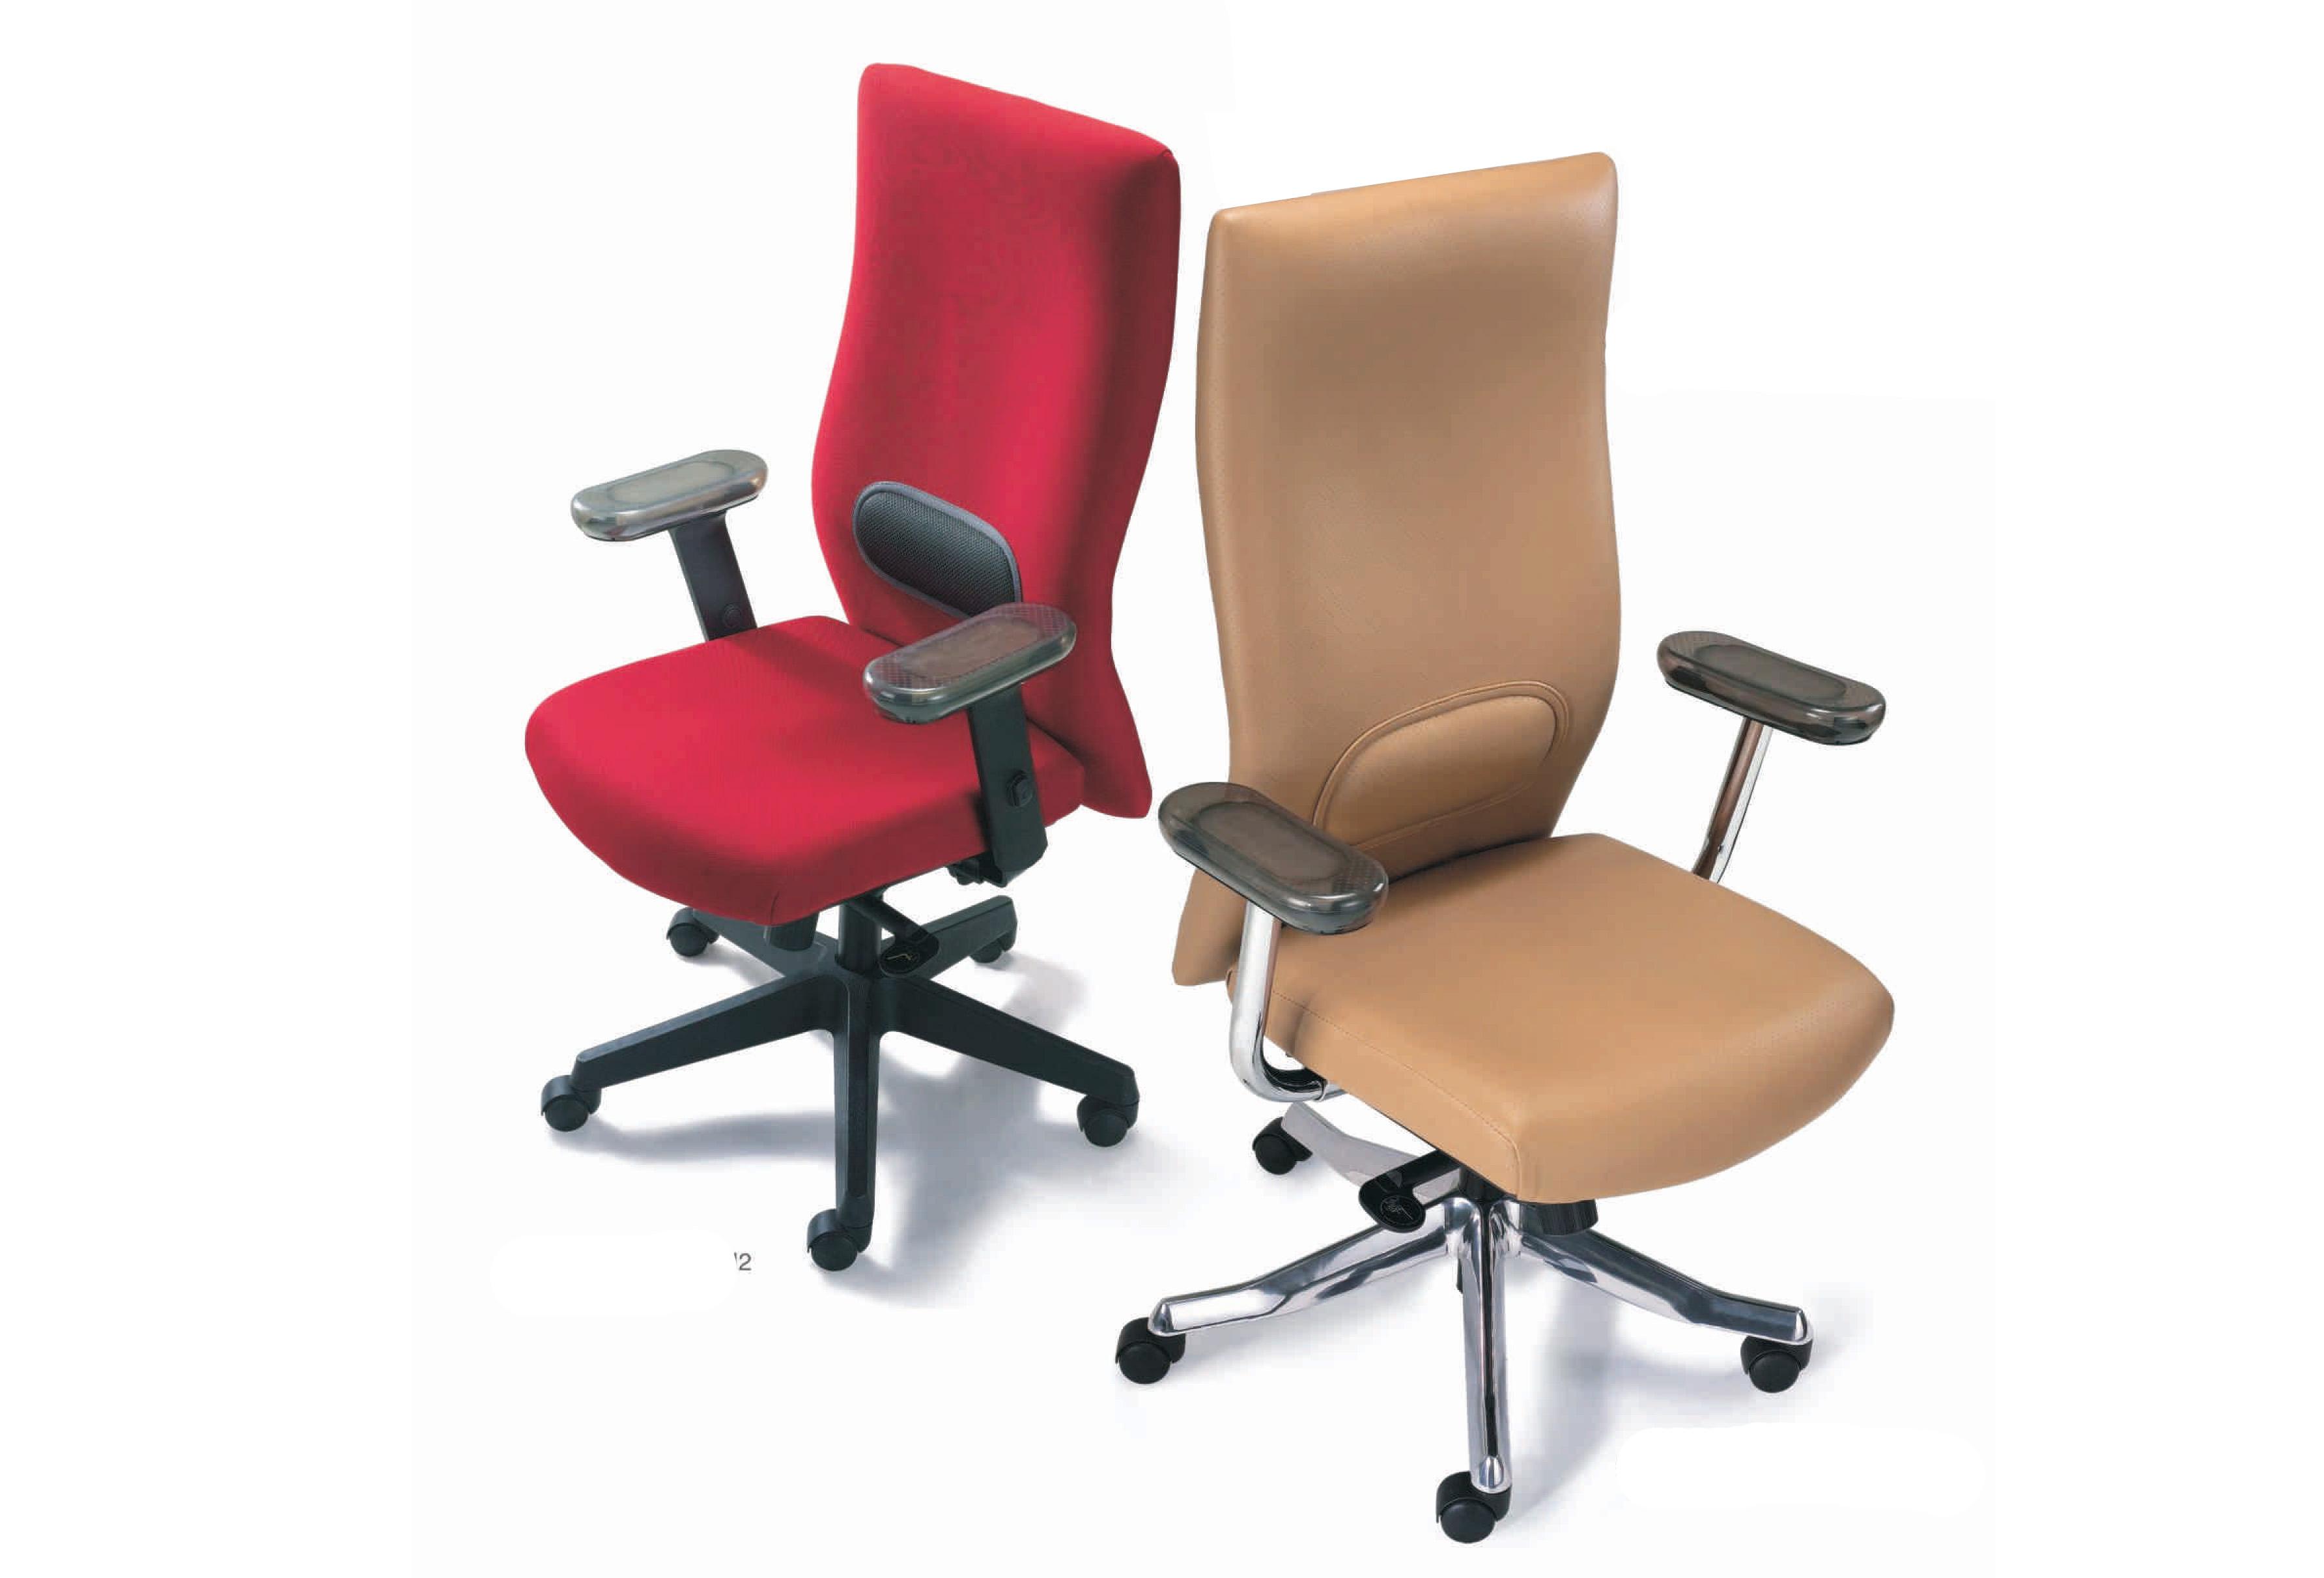 Zibra – Desk Chair